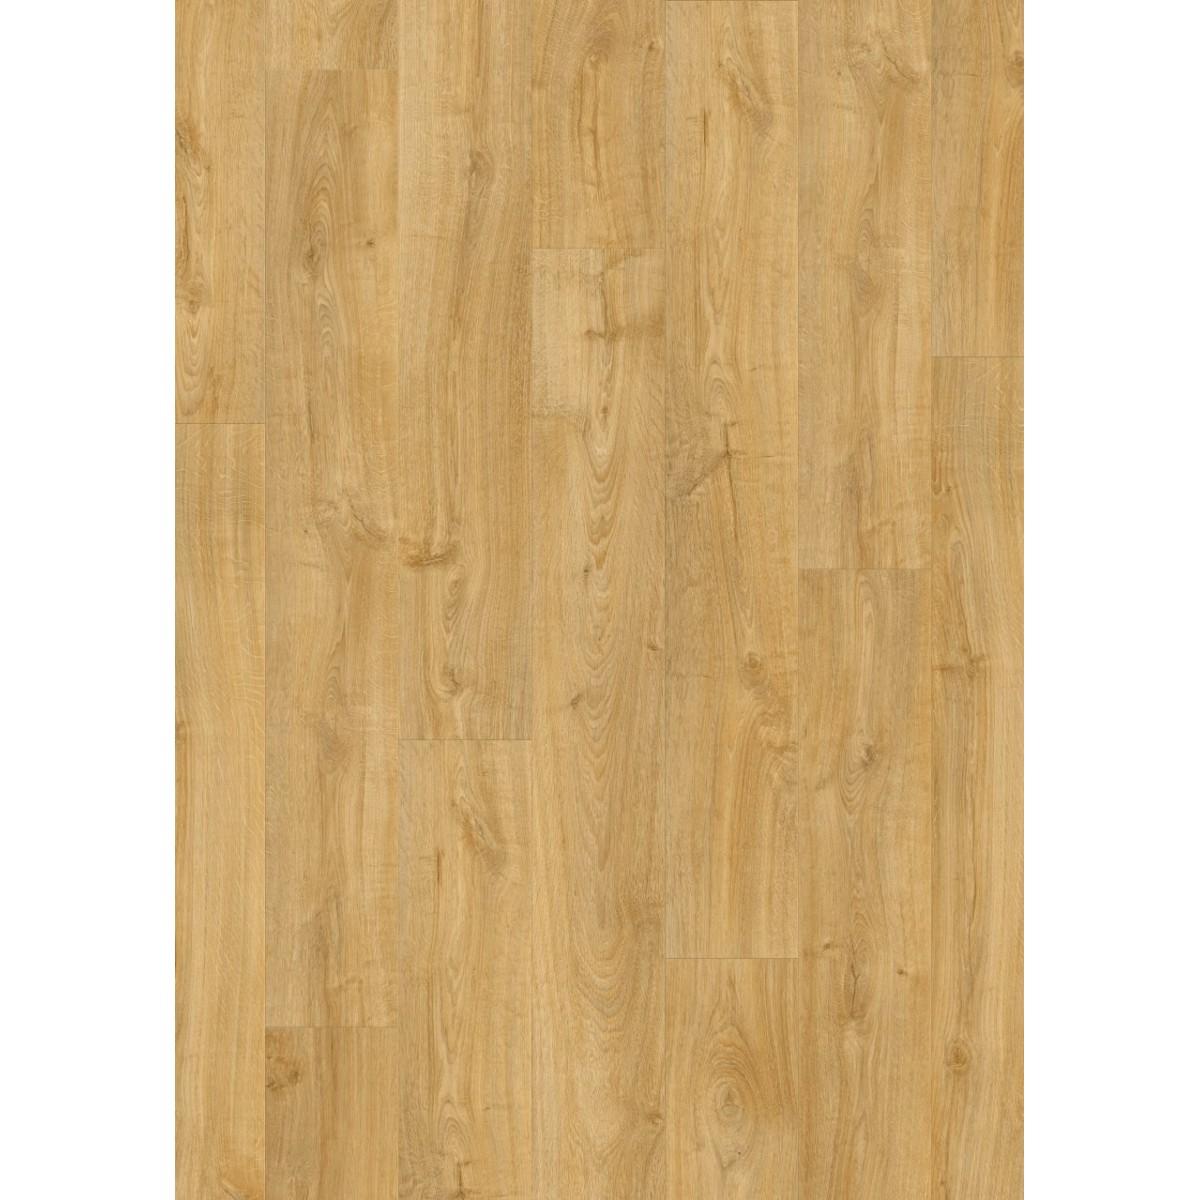 Pergo Sensation Village Oak Plank 4v, Pergo Laminate Flooring Lifetime Warranty